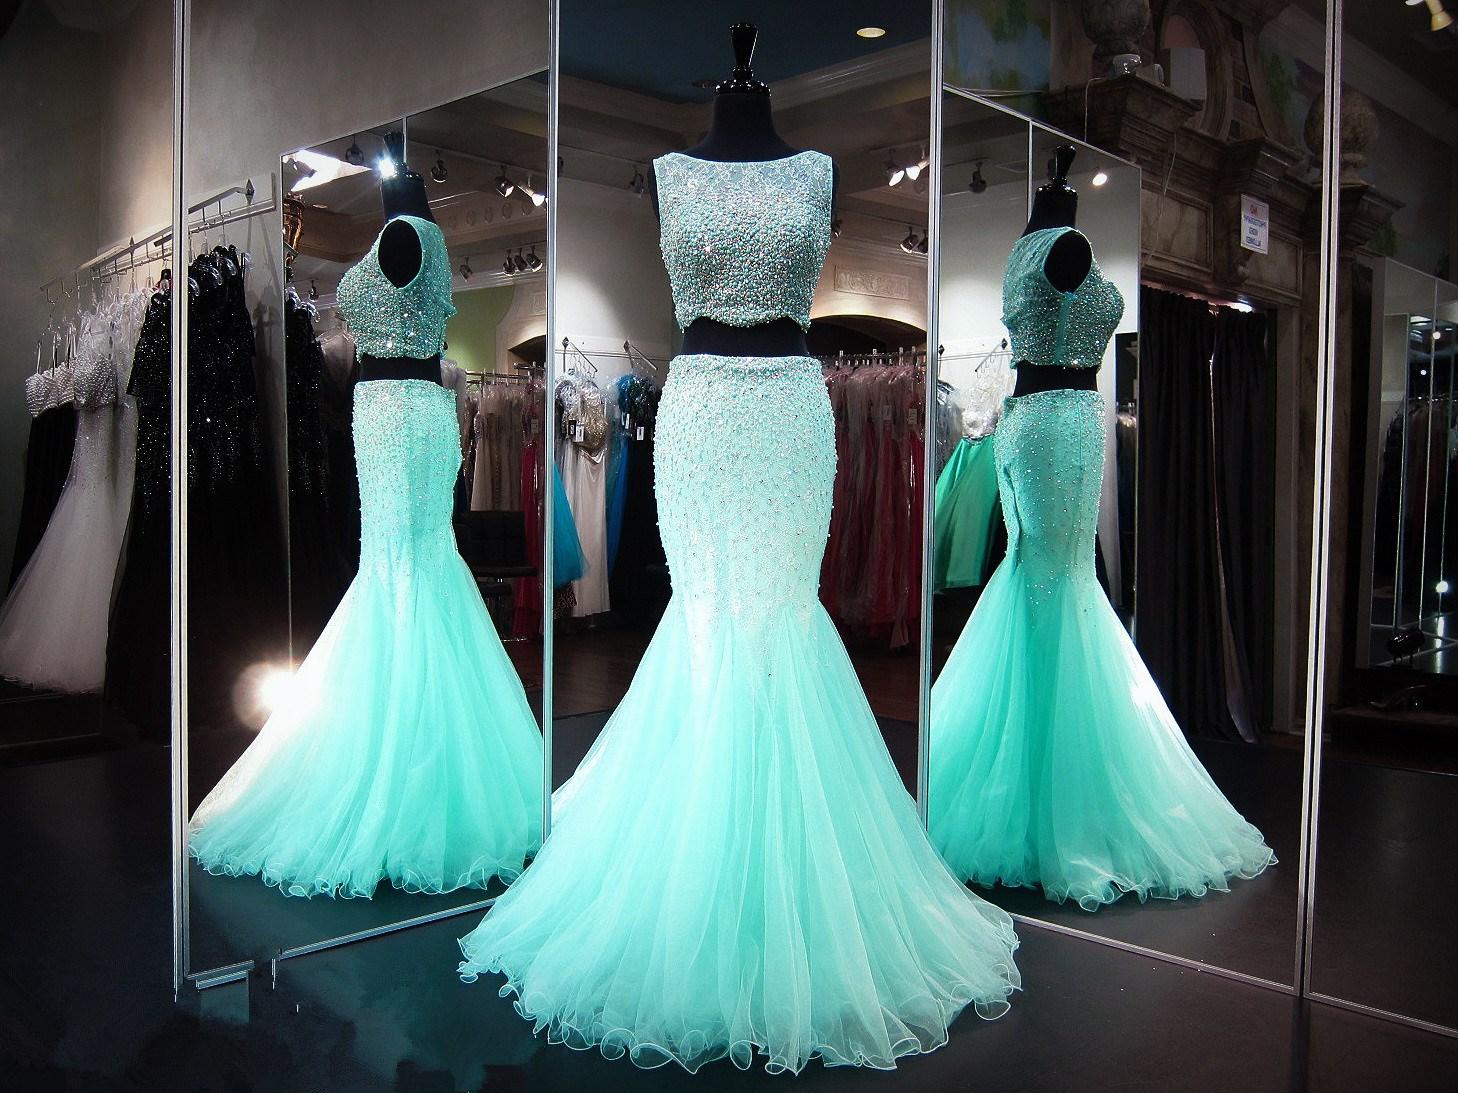 2017 Custom Made Two Pieces Prom Dress,Beading Evening Dress, Floor ...